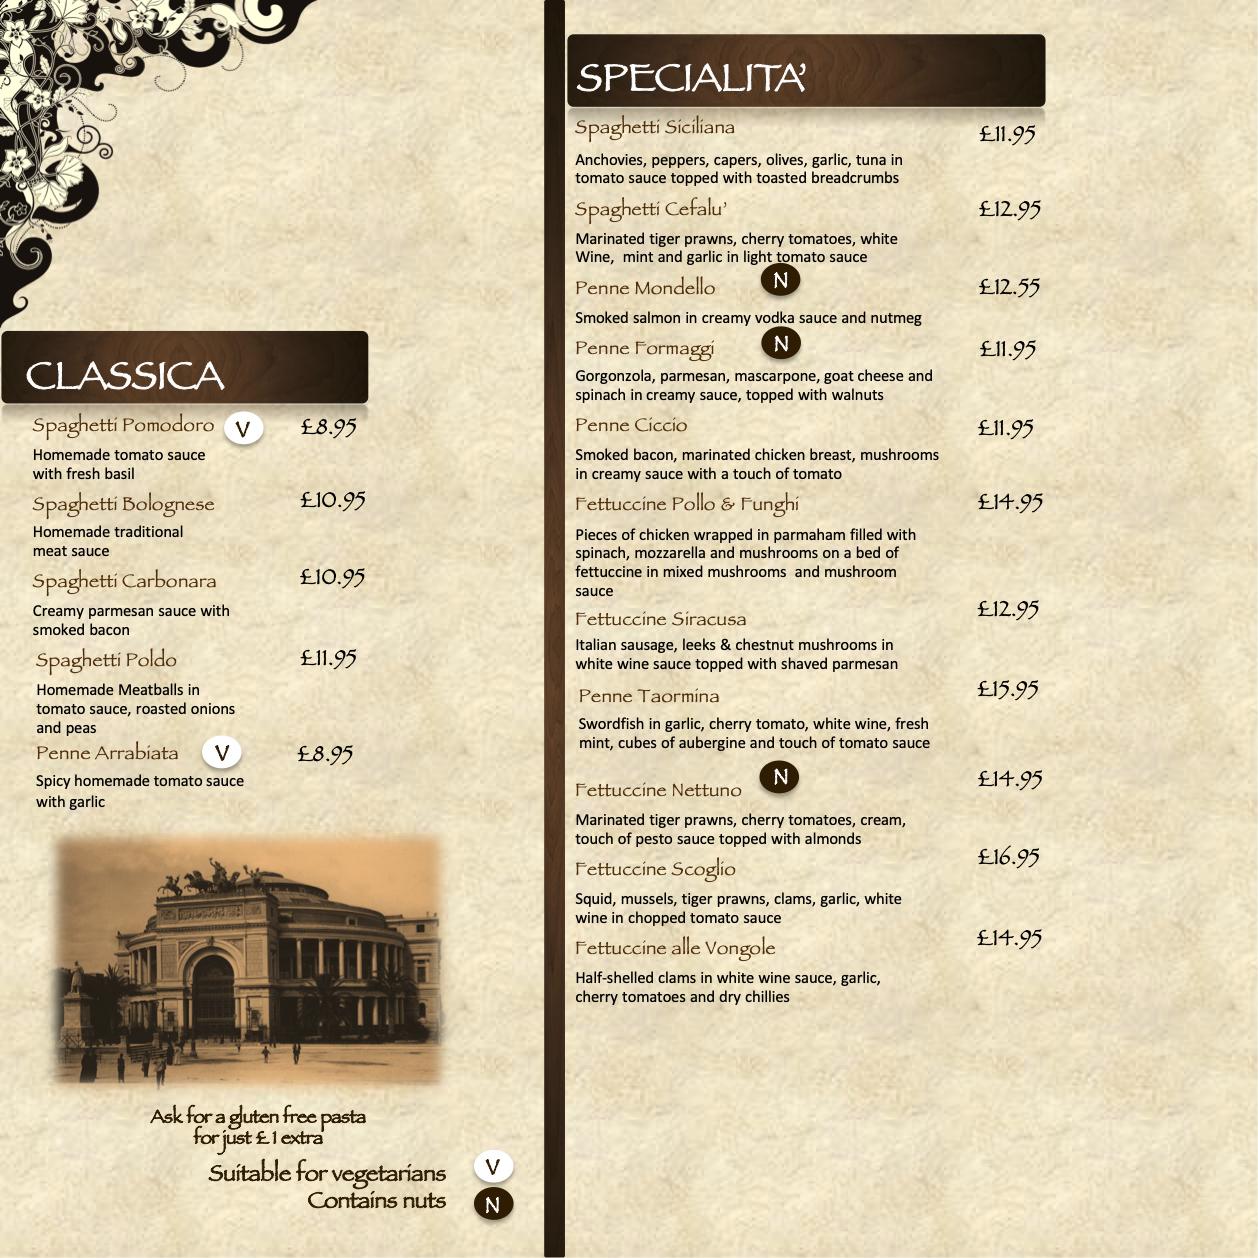 menu 2020 sicily5